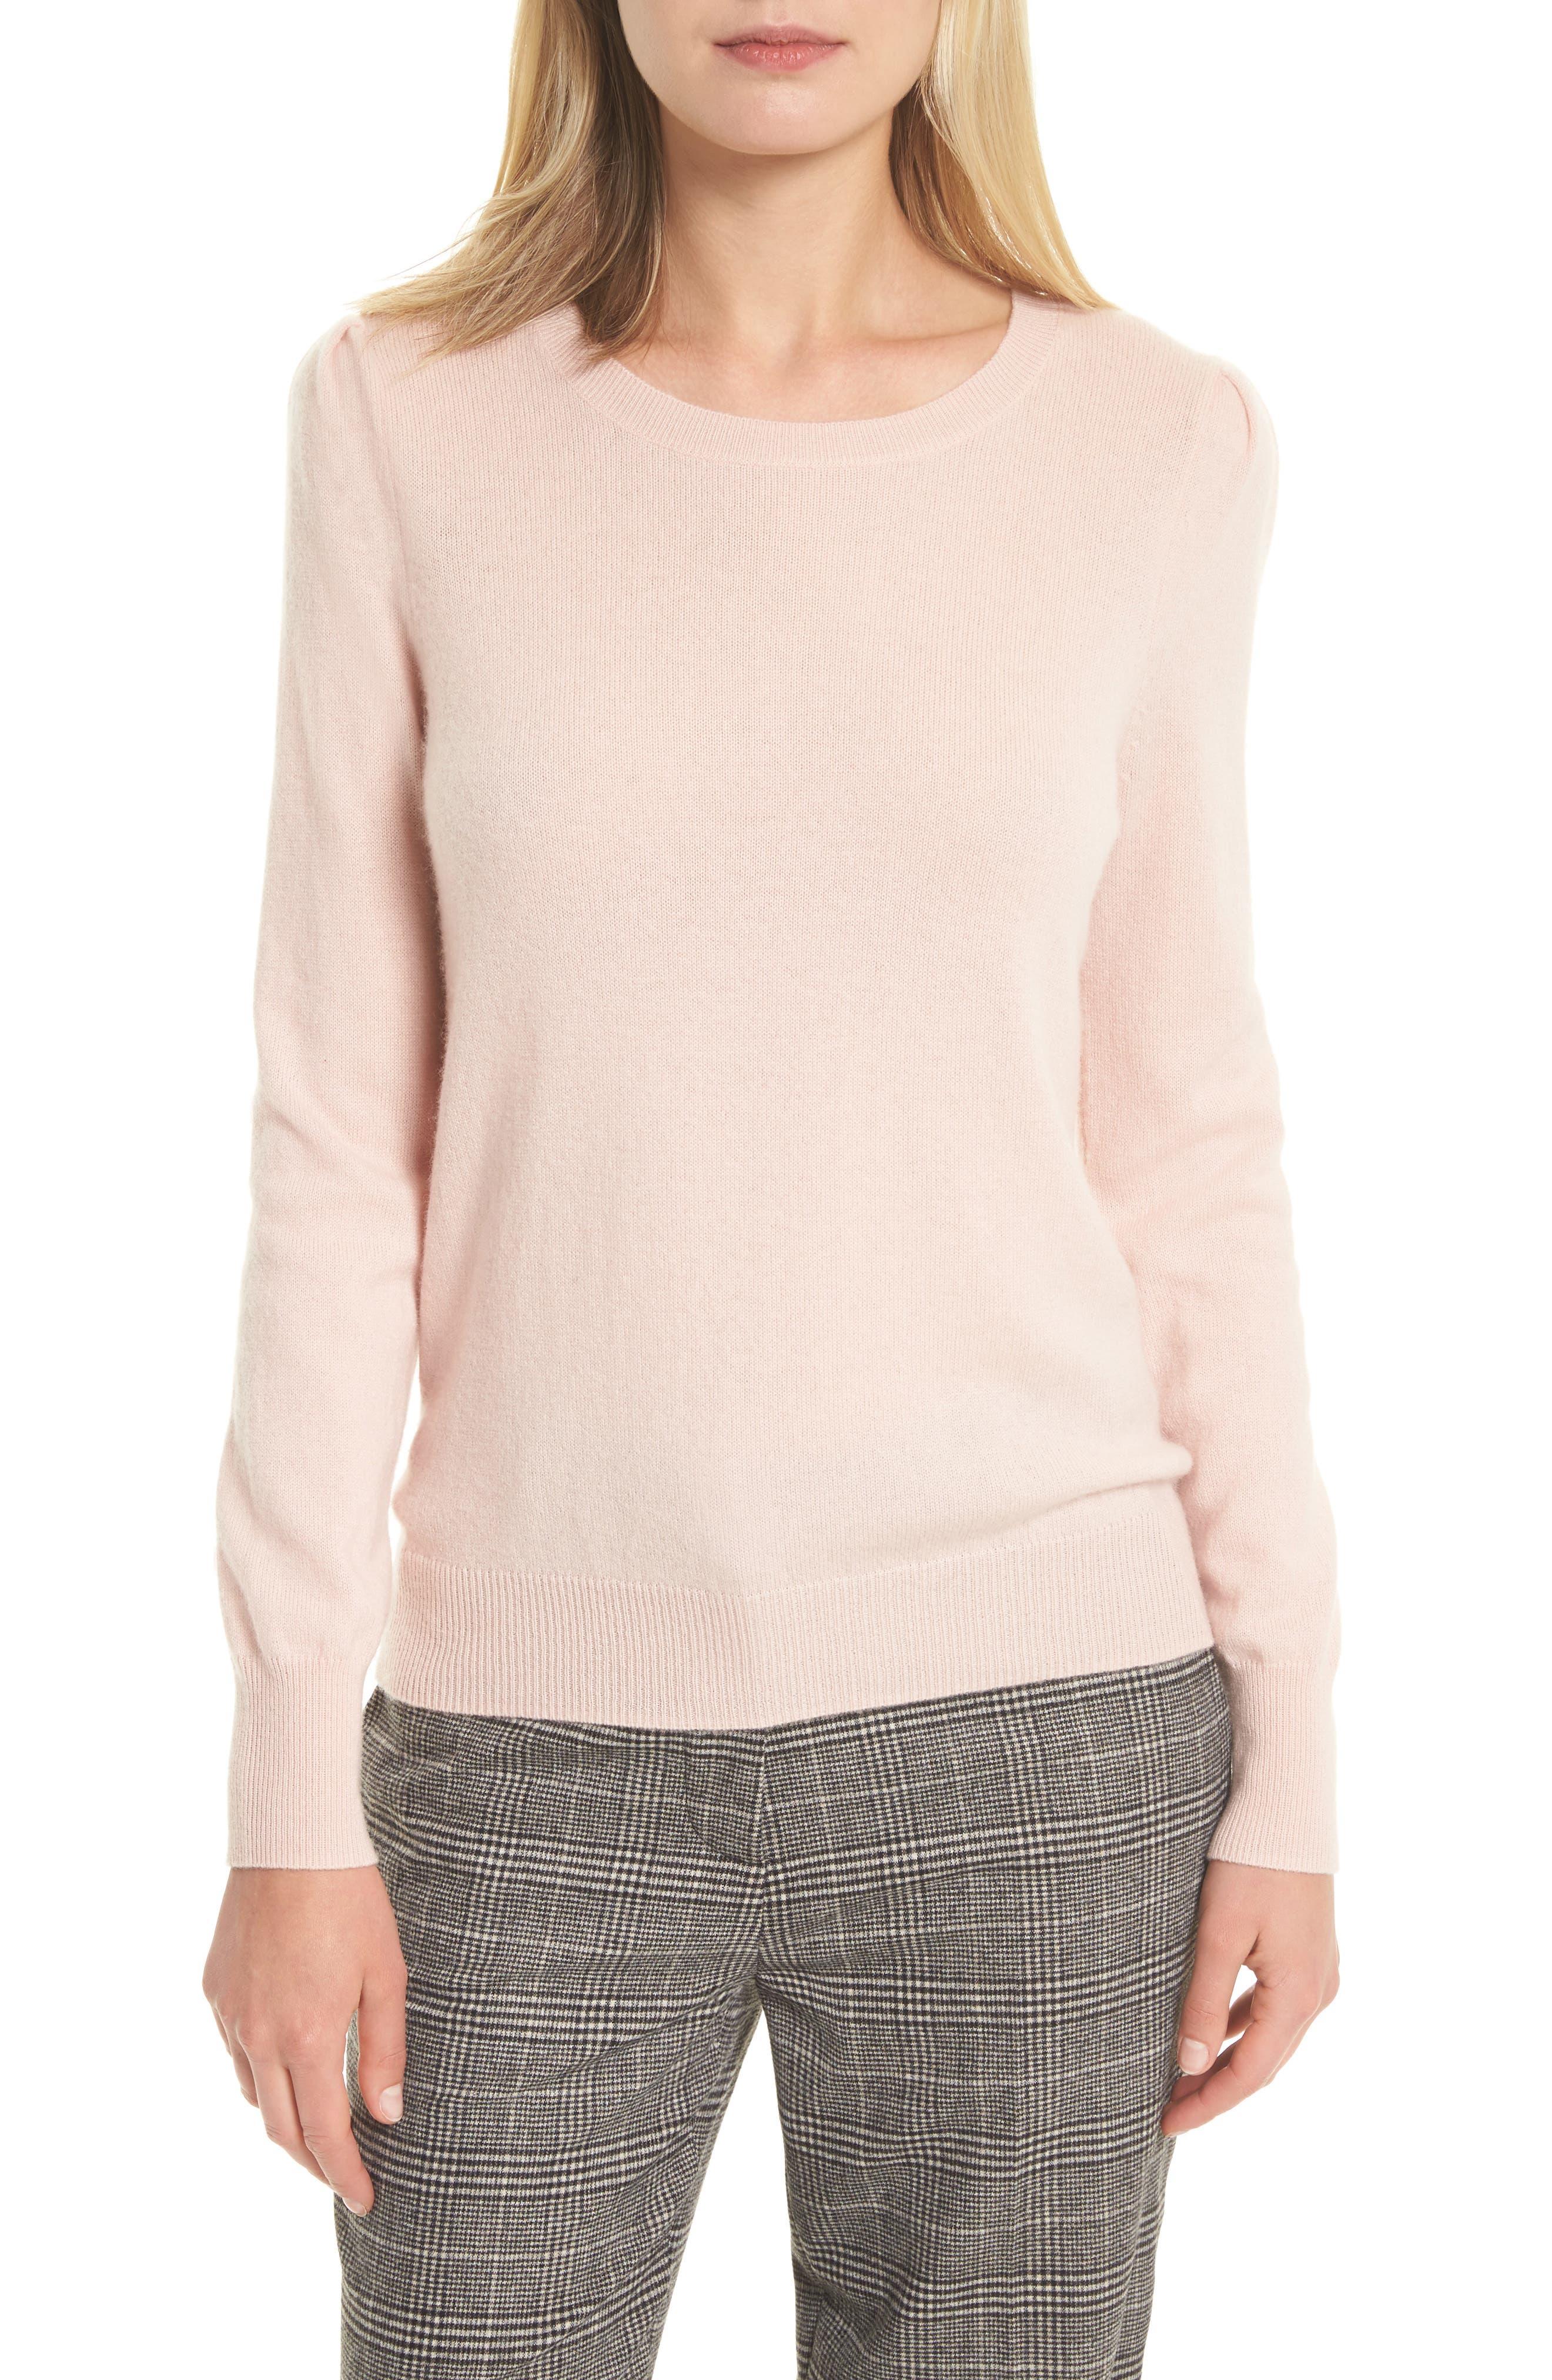 Joie Abiline Wool & Cashmere Sweater